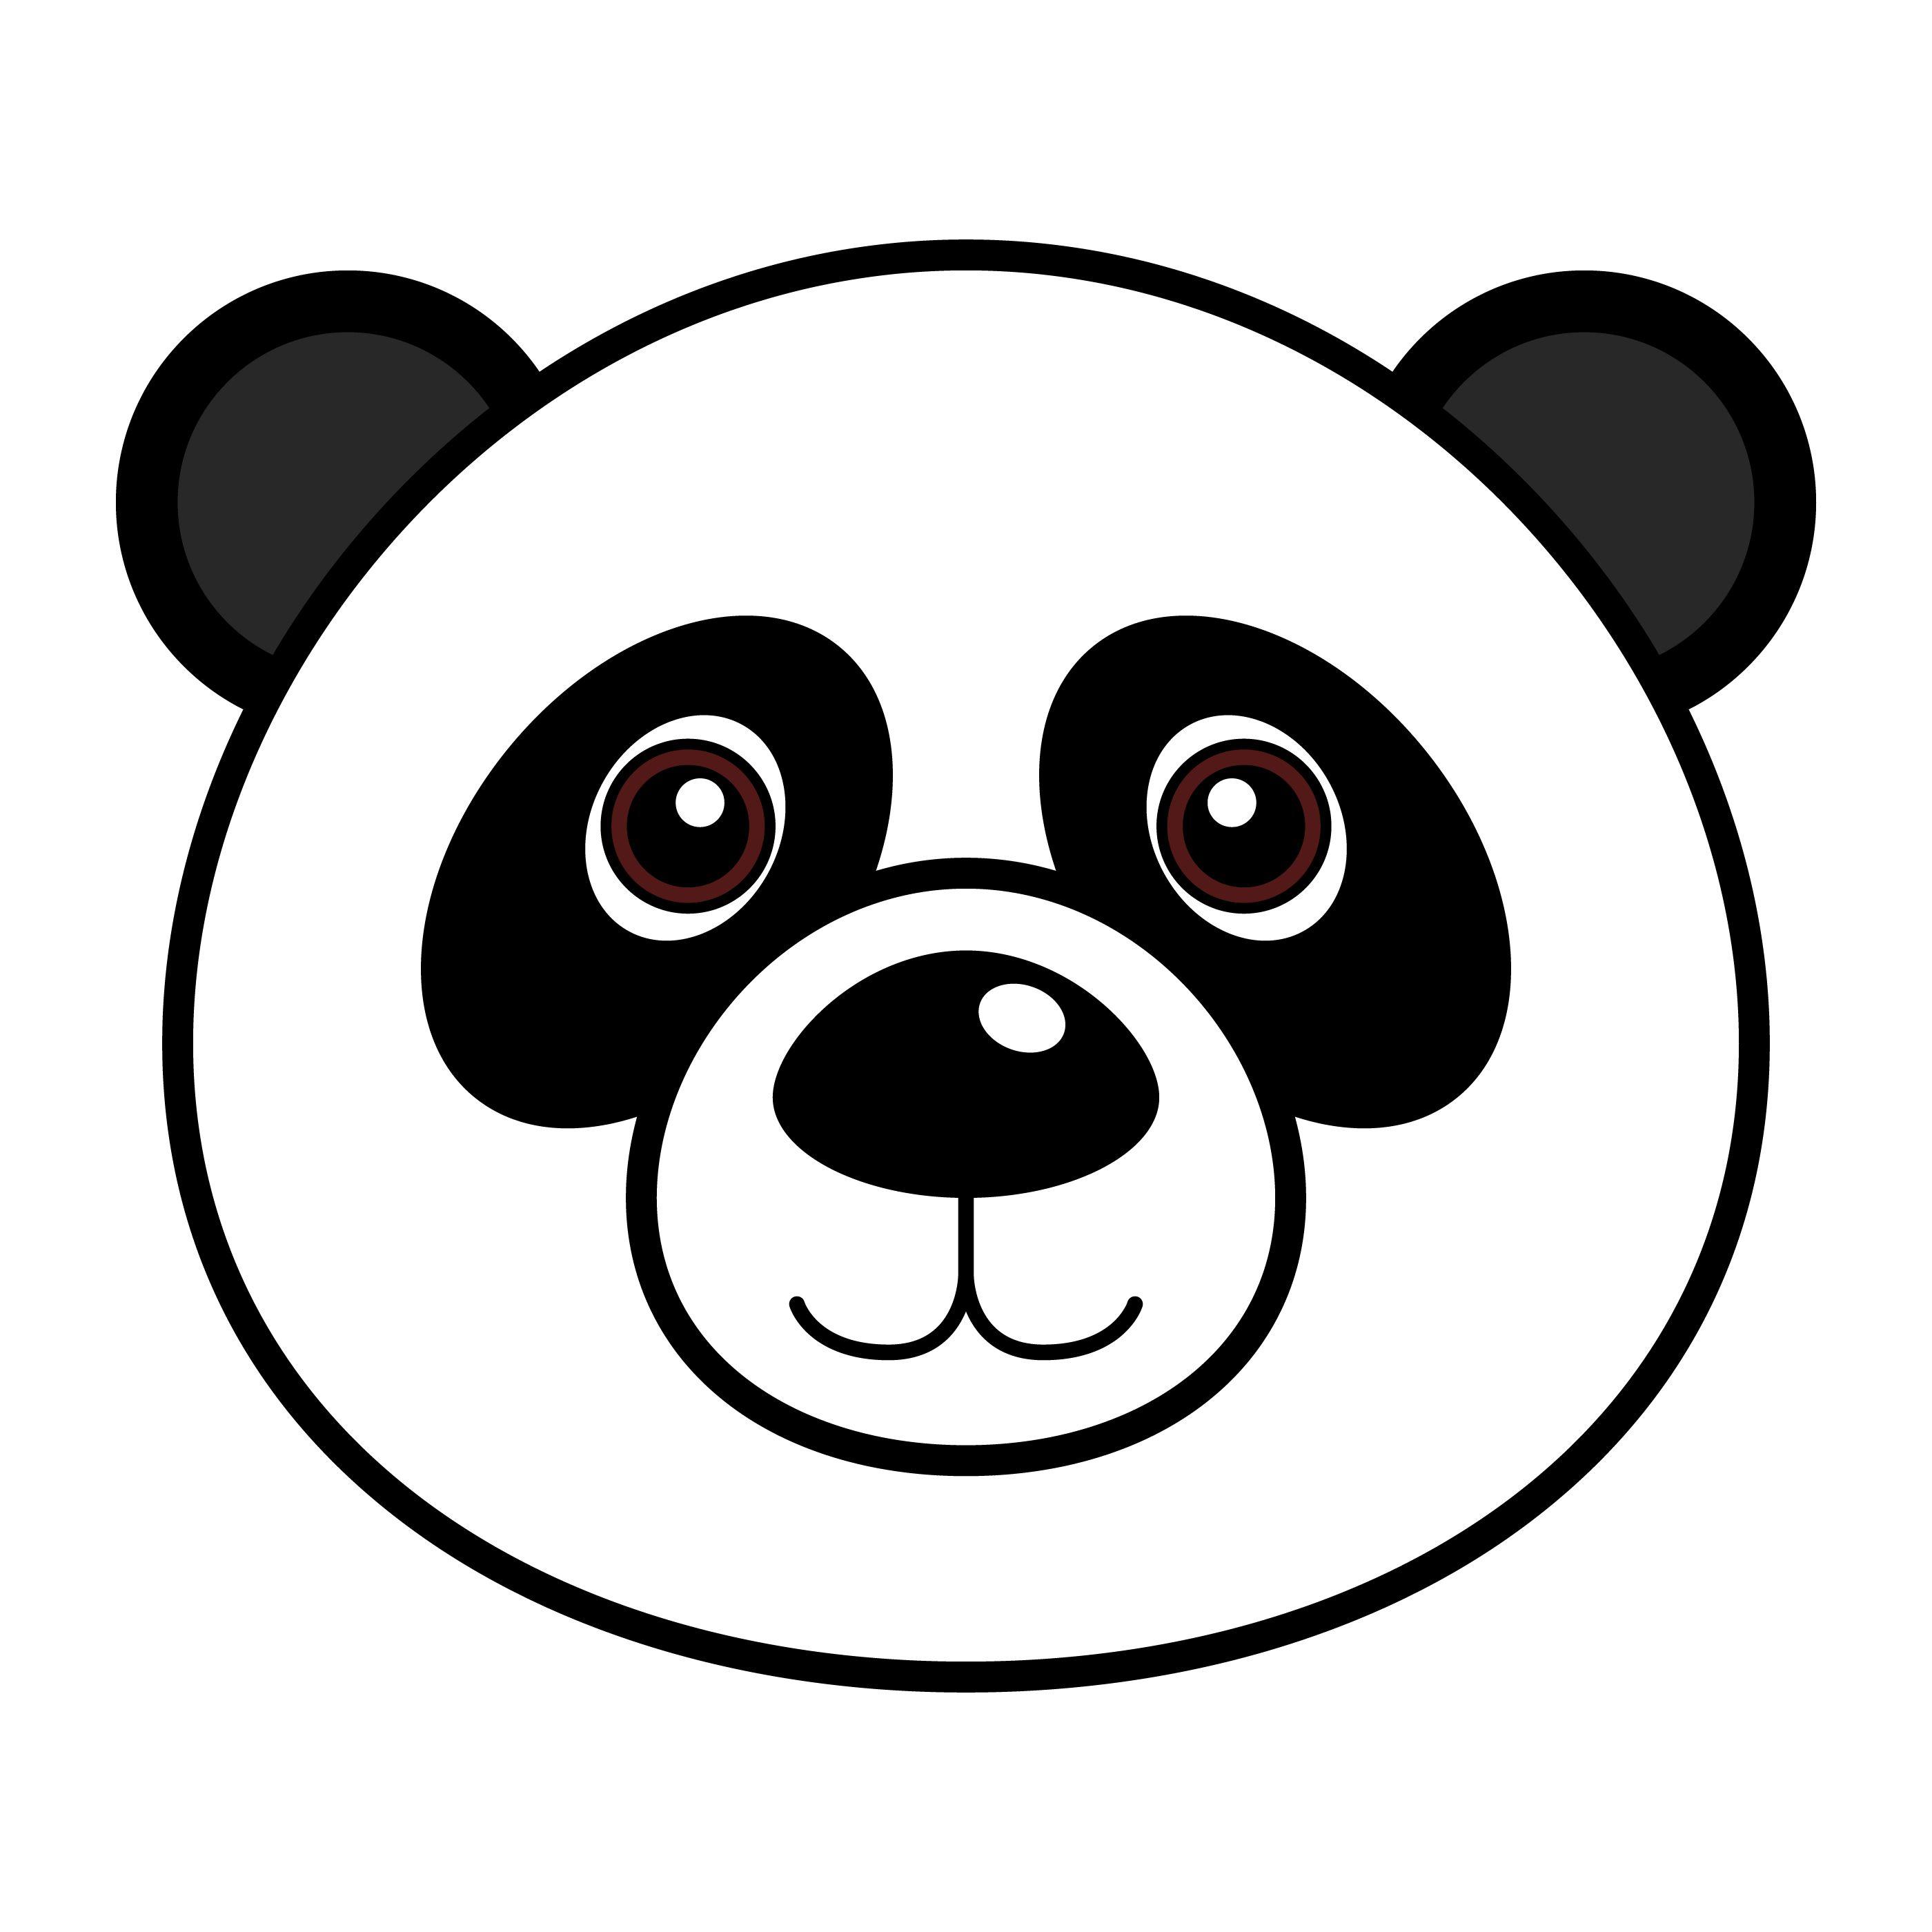 Pin By Andreita Carcamo Aros On Panda Bears Bear Coloring Pages Bear Coloring Easy Drawings